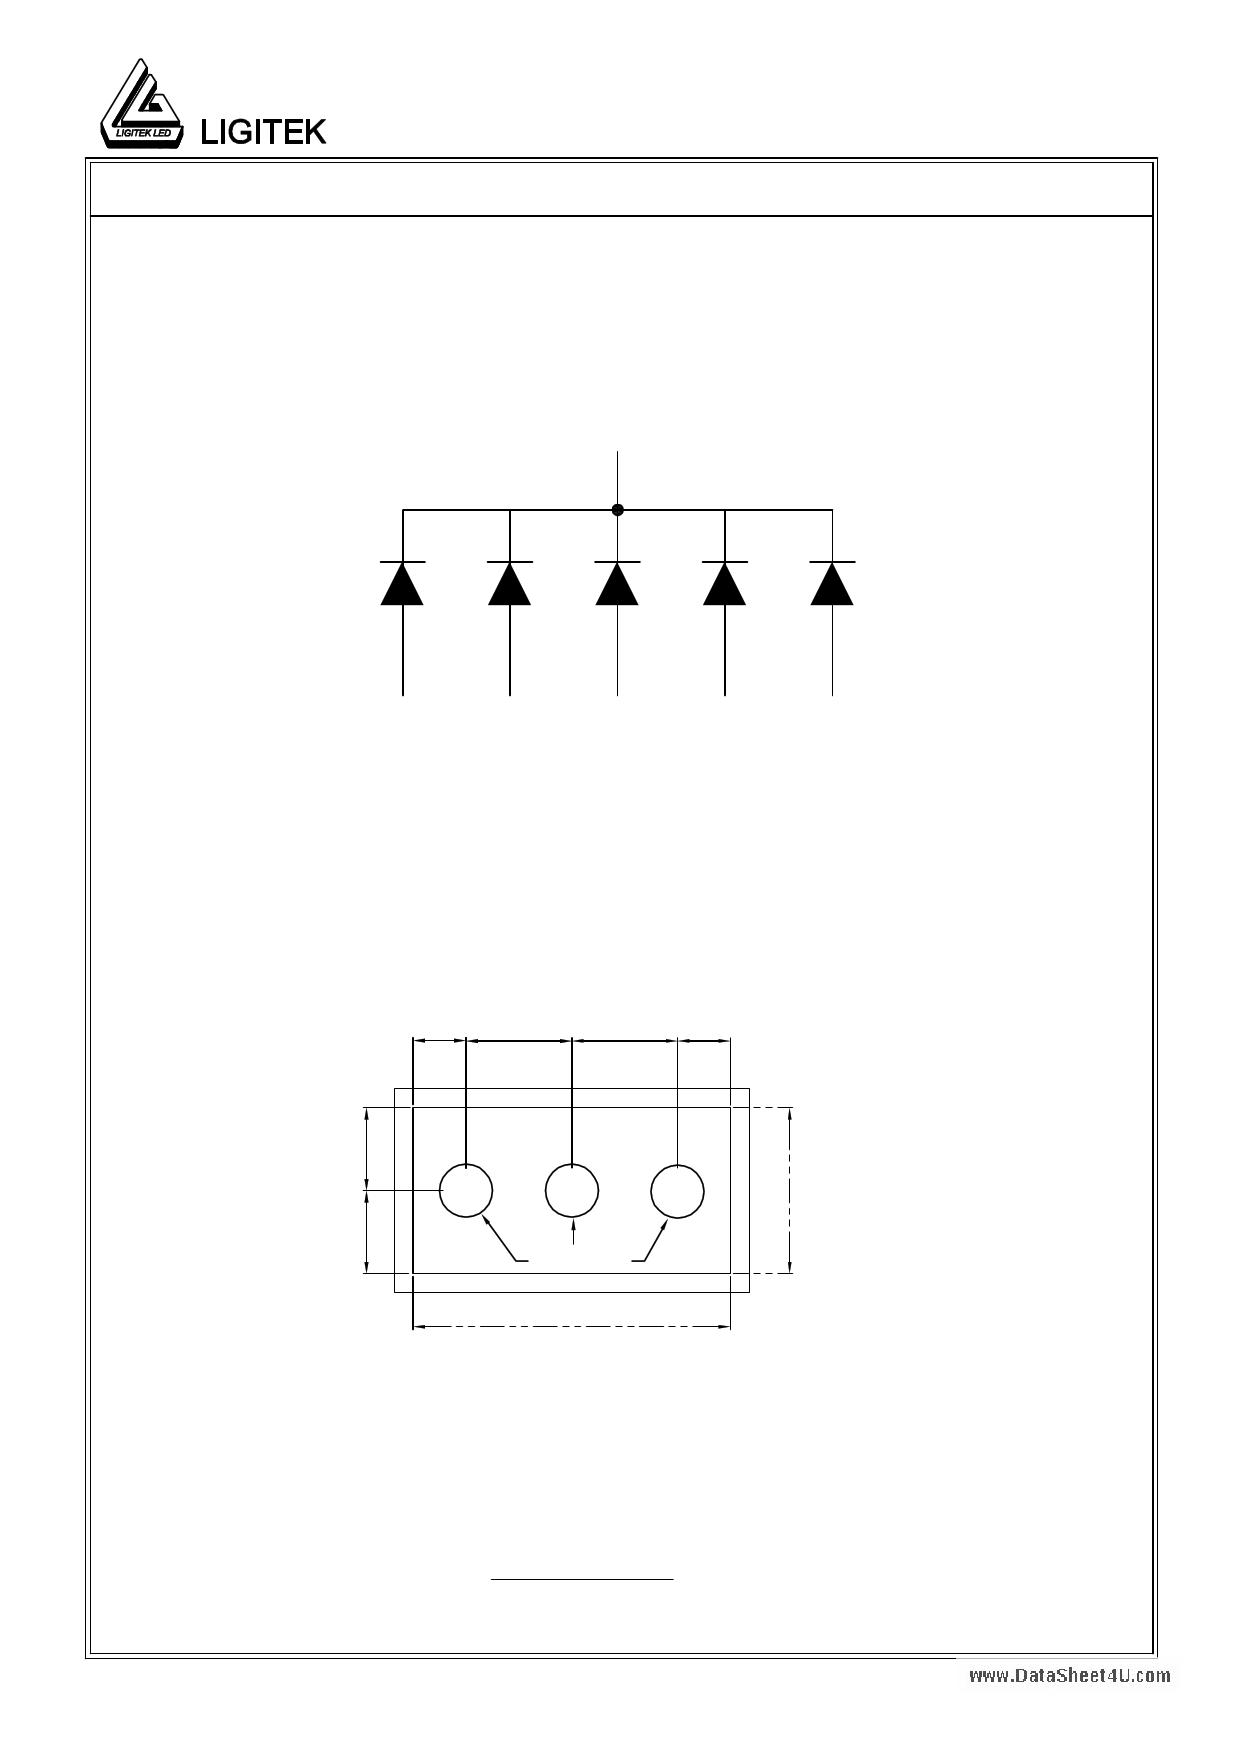 L-00501VY-S Даташит, Описание, Даташиты